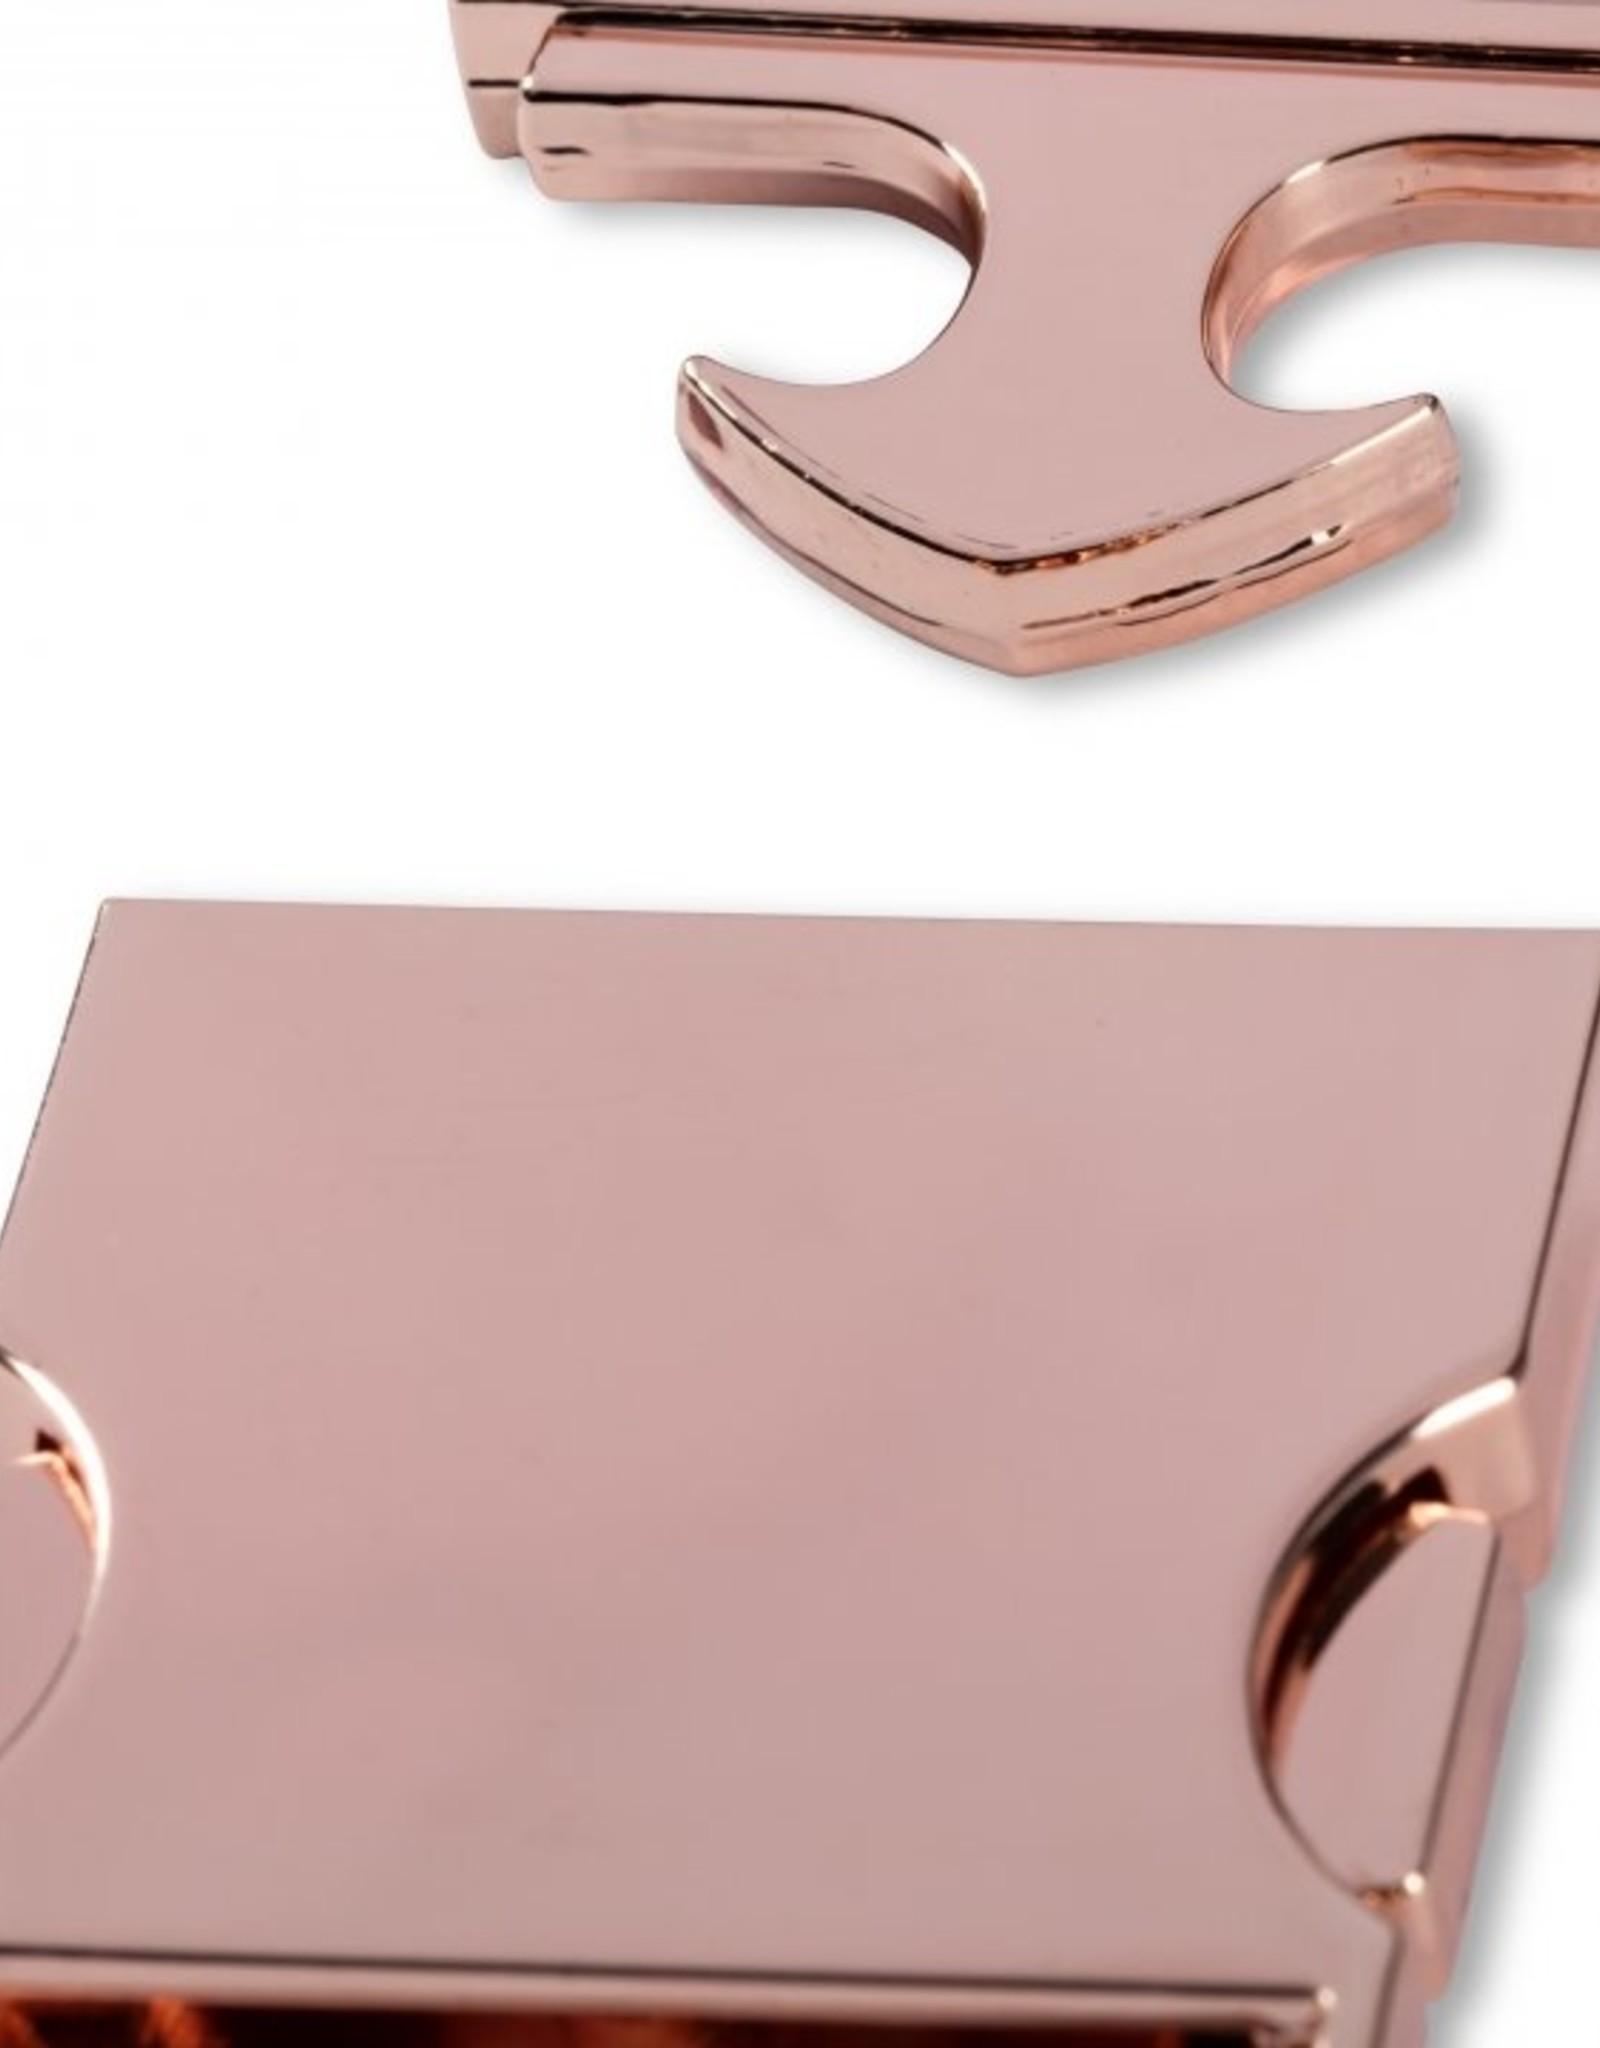 prym Klikgesp -Rosé Goud - 30mm